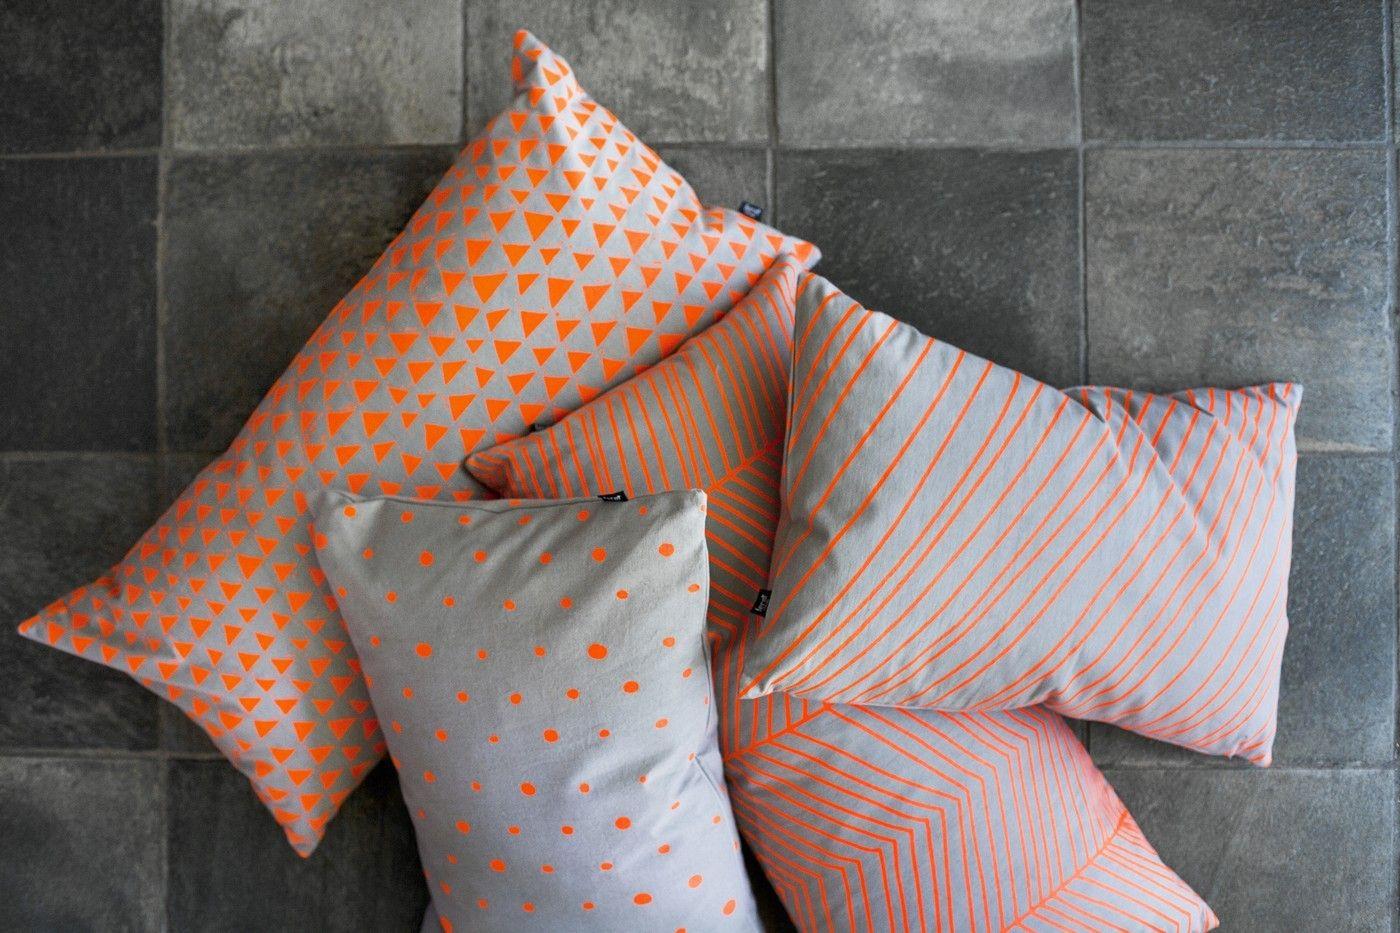 coussin mountain large 80x40 cm orange gris ferm living. Black Bedroom Furniture Sets. Home Design Ideas